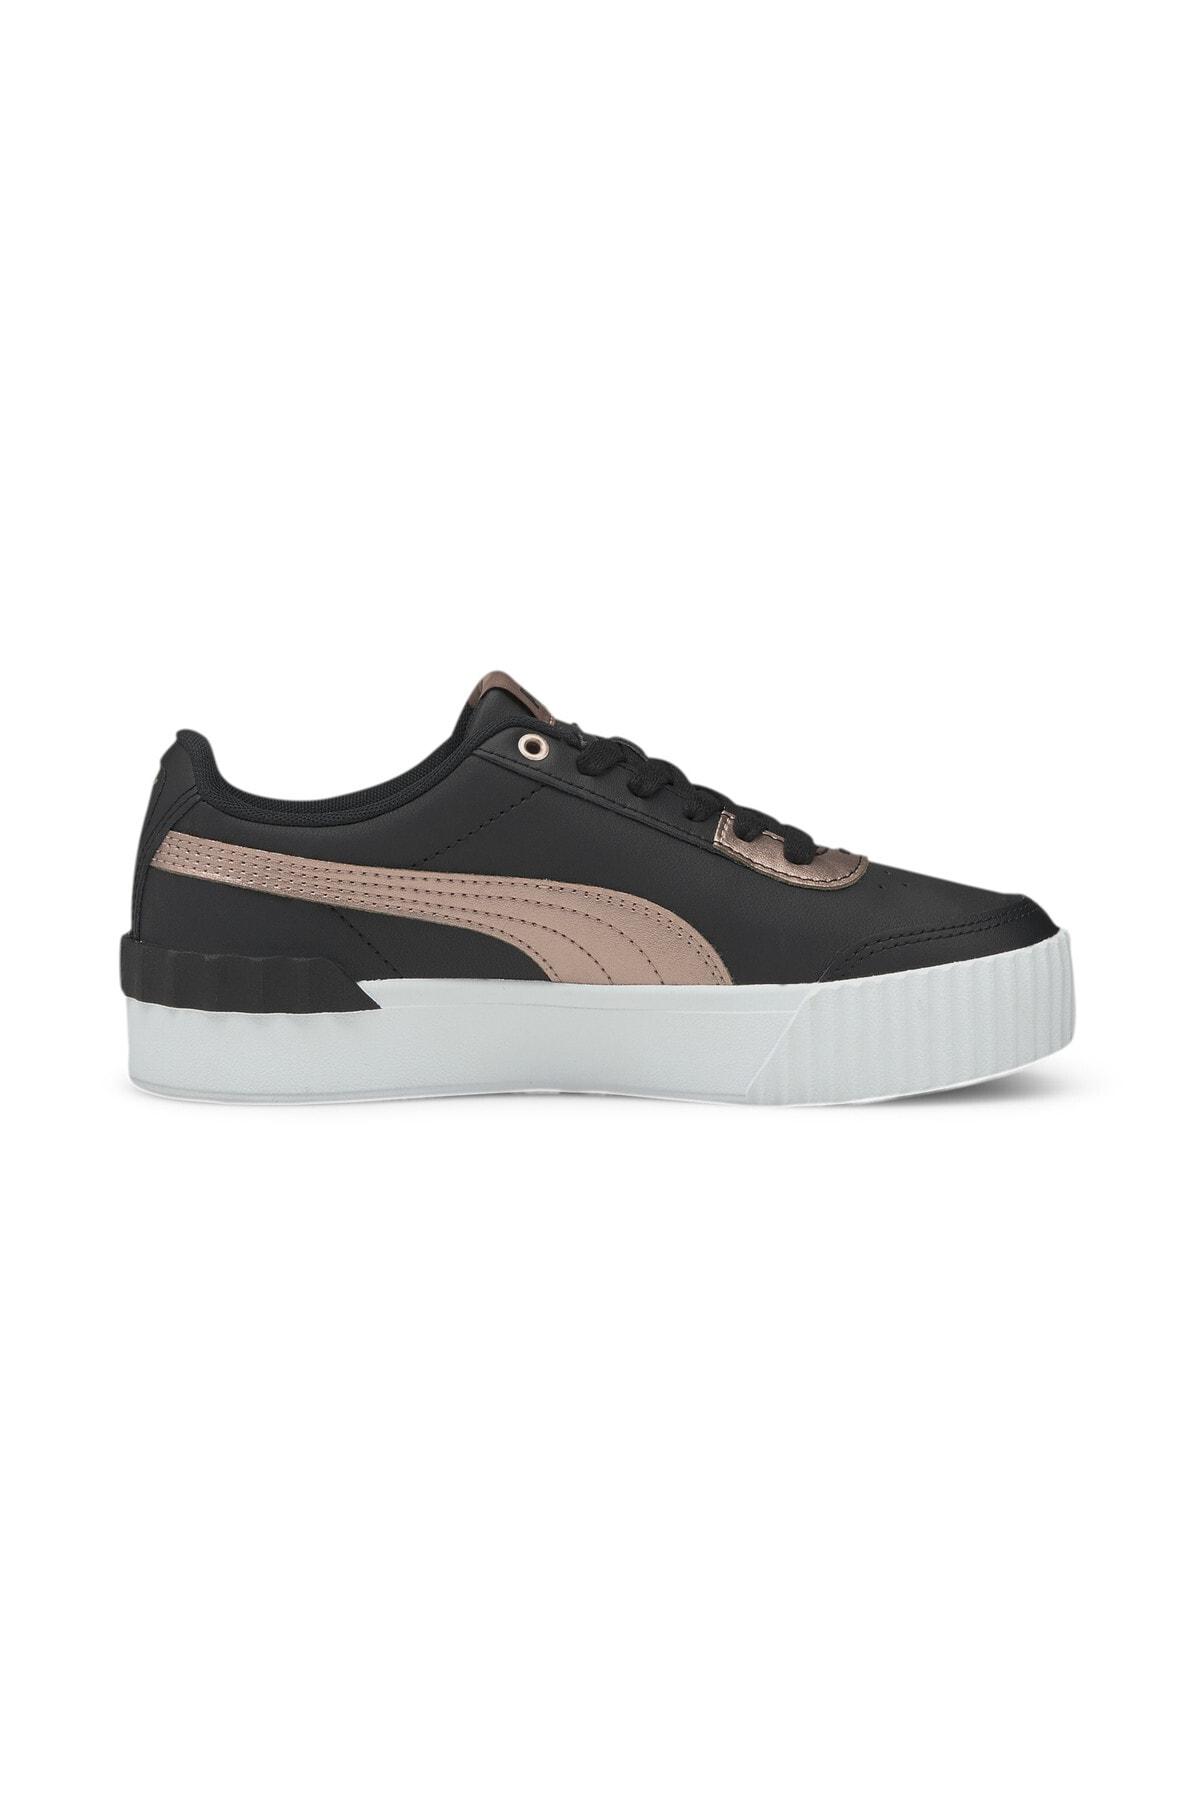 Puma Kadın Sneaker - CARINA LIFT METALLIC - 37599502 4